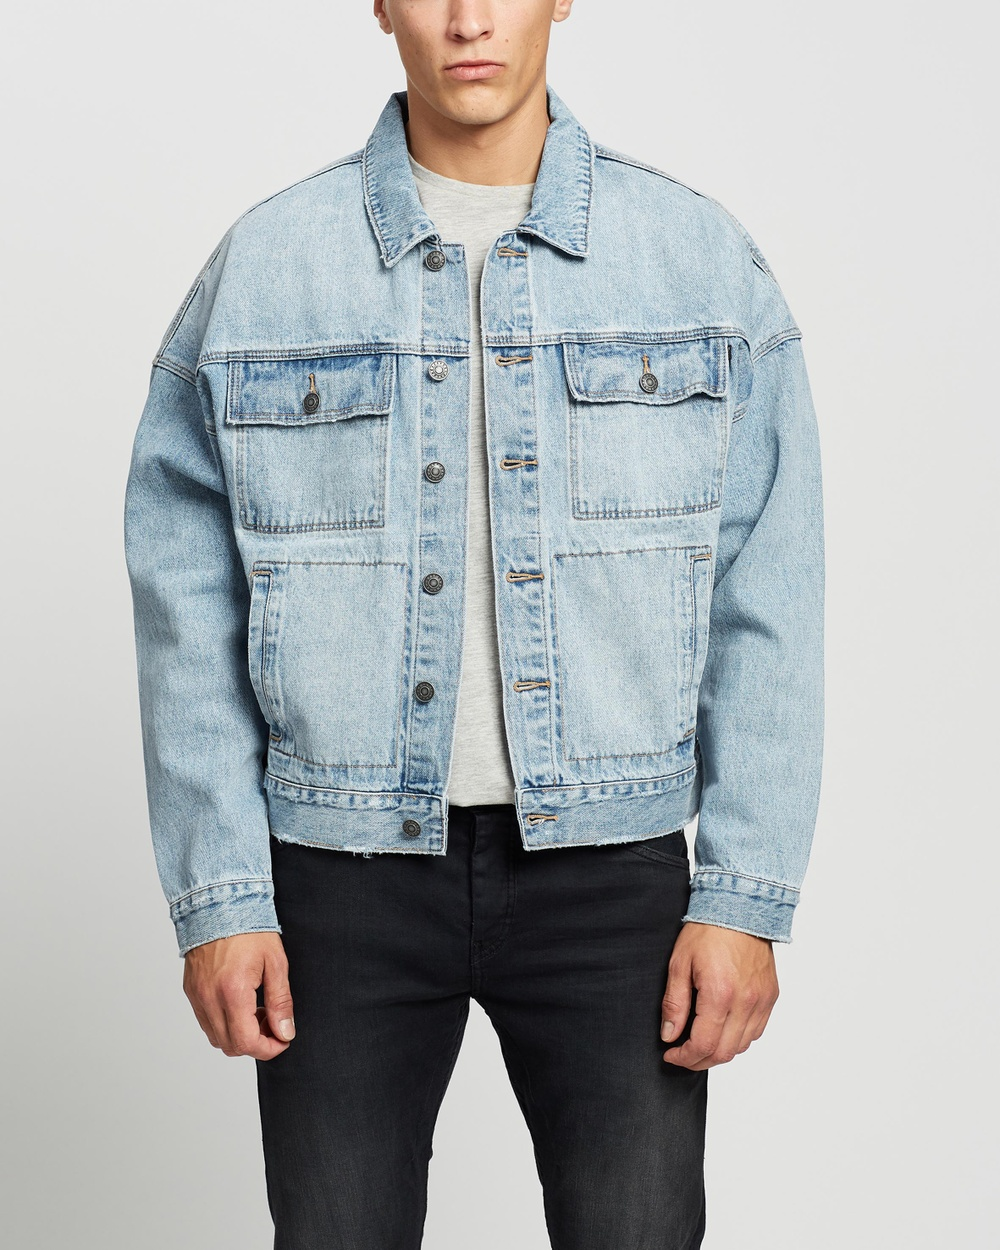 Abrand A Moto Jacket Clothing Lemmy